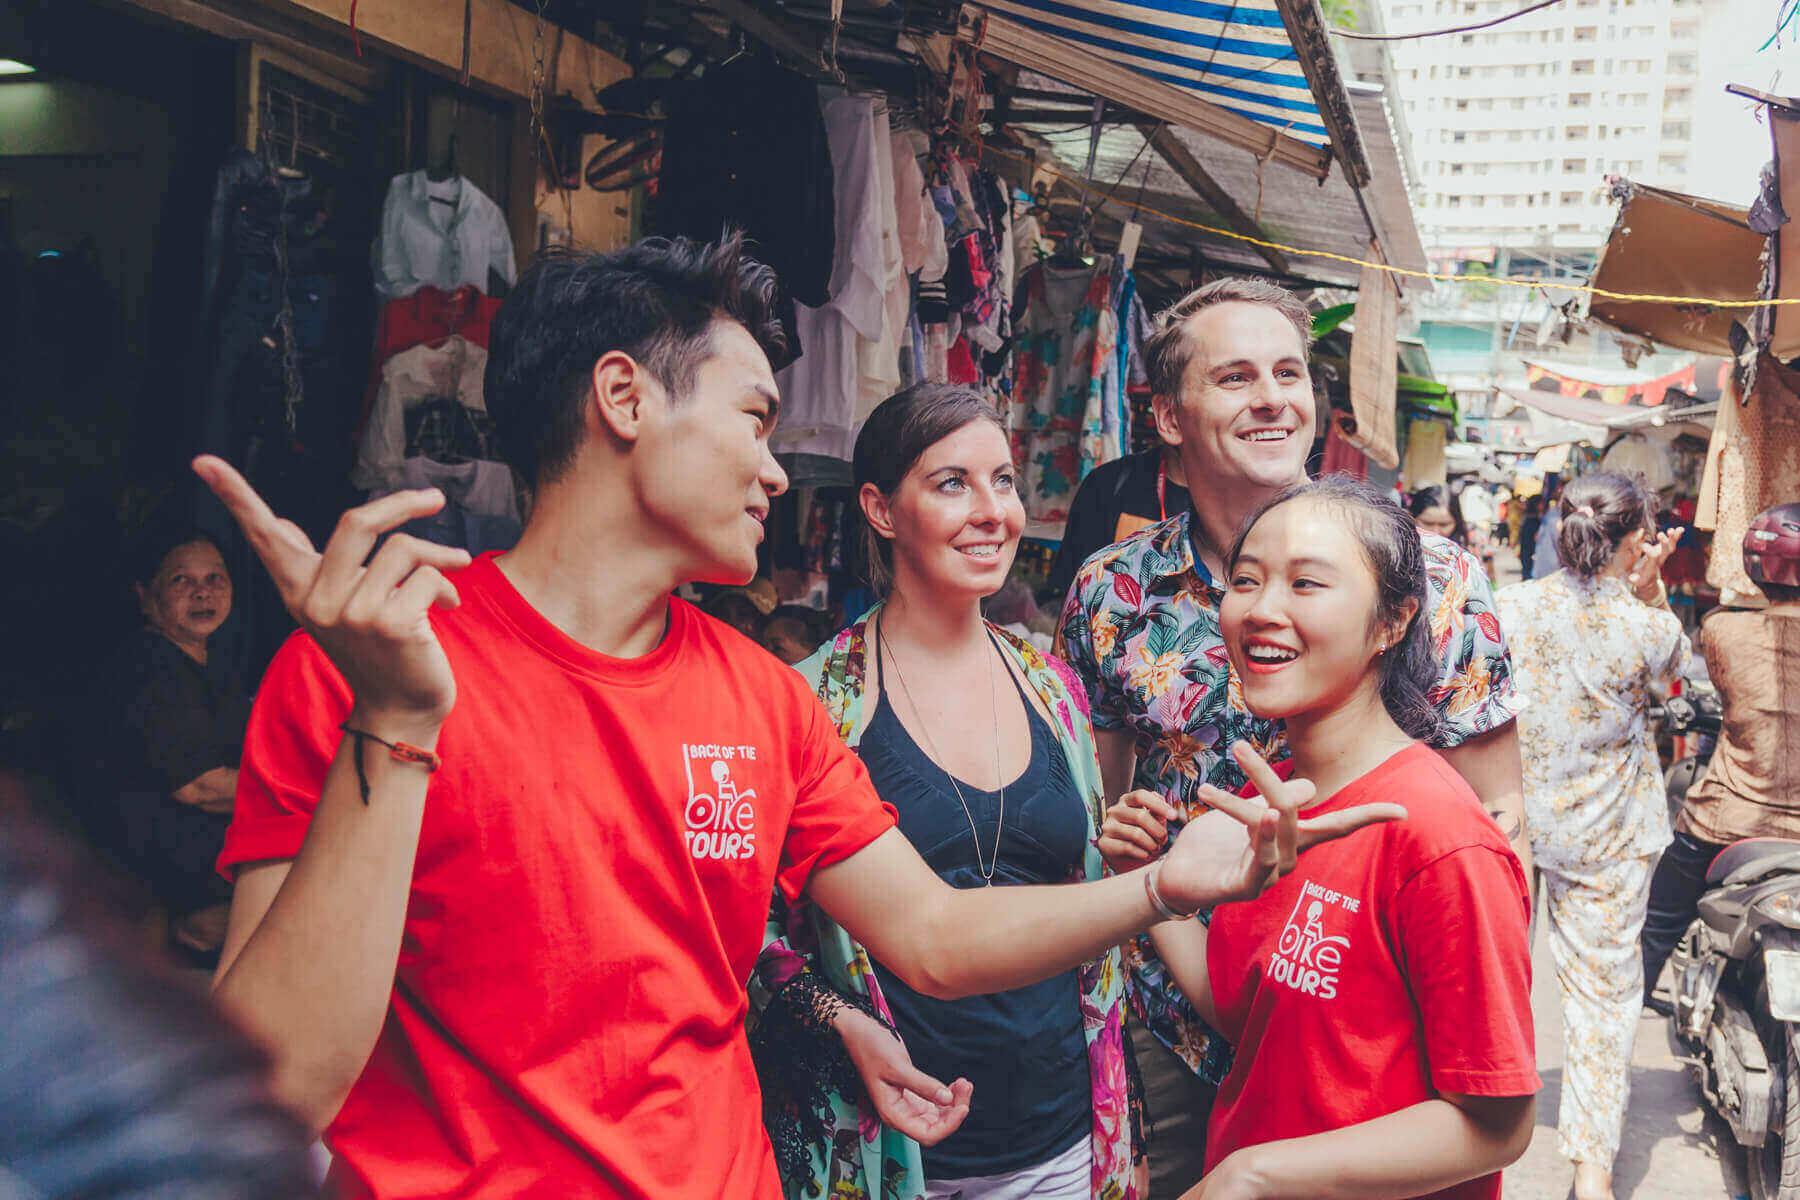 Sightseeing in Saigon